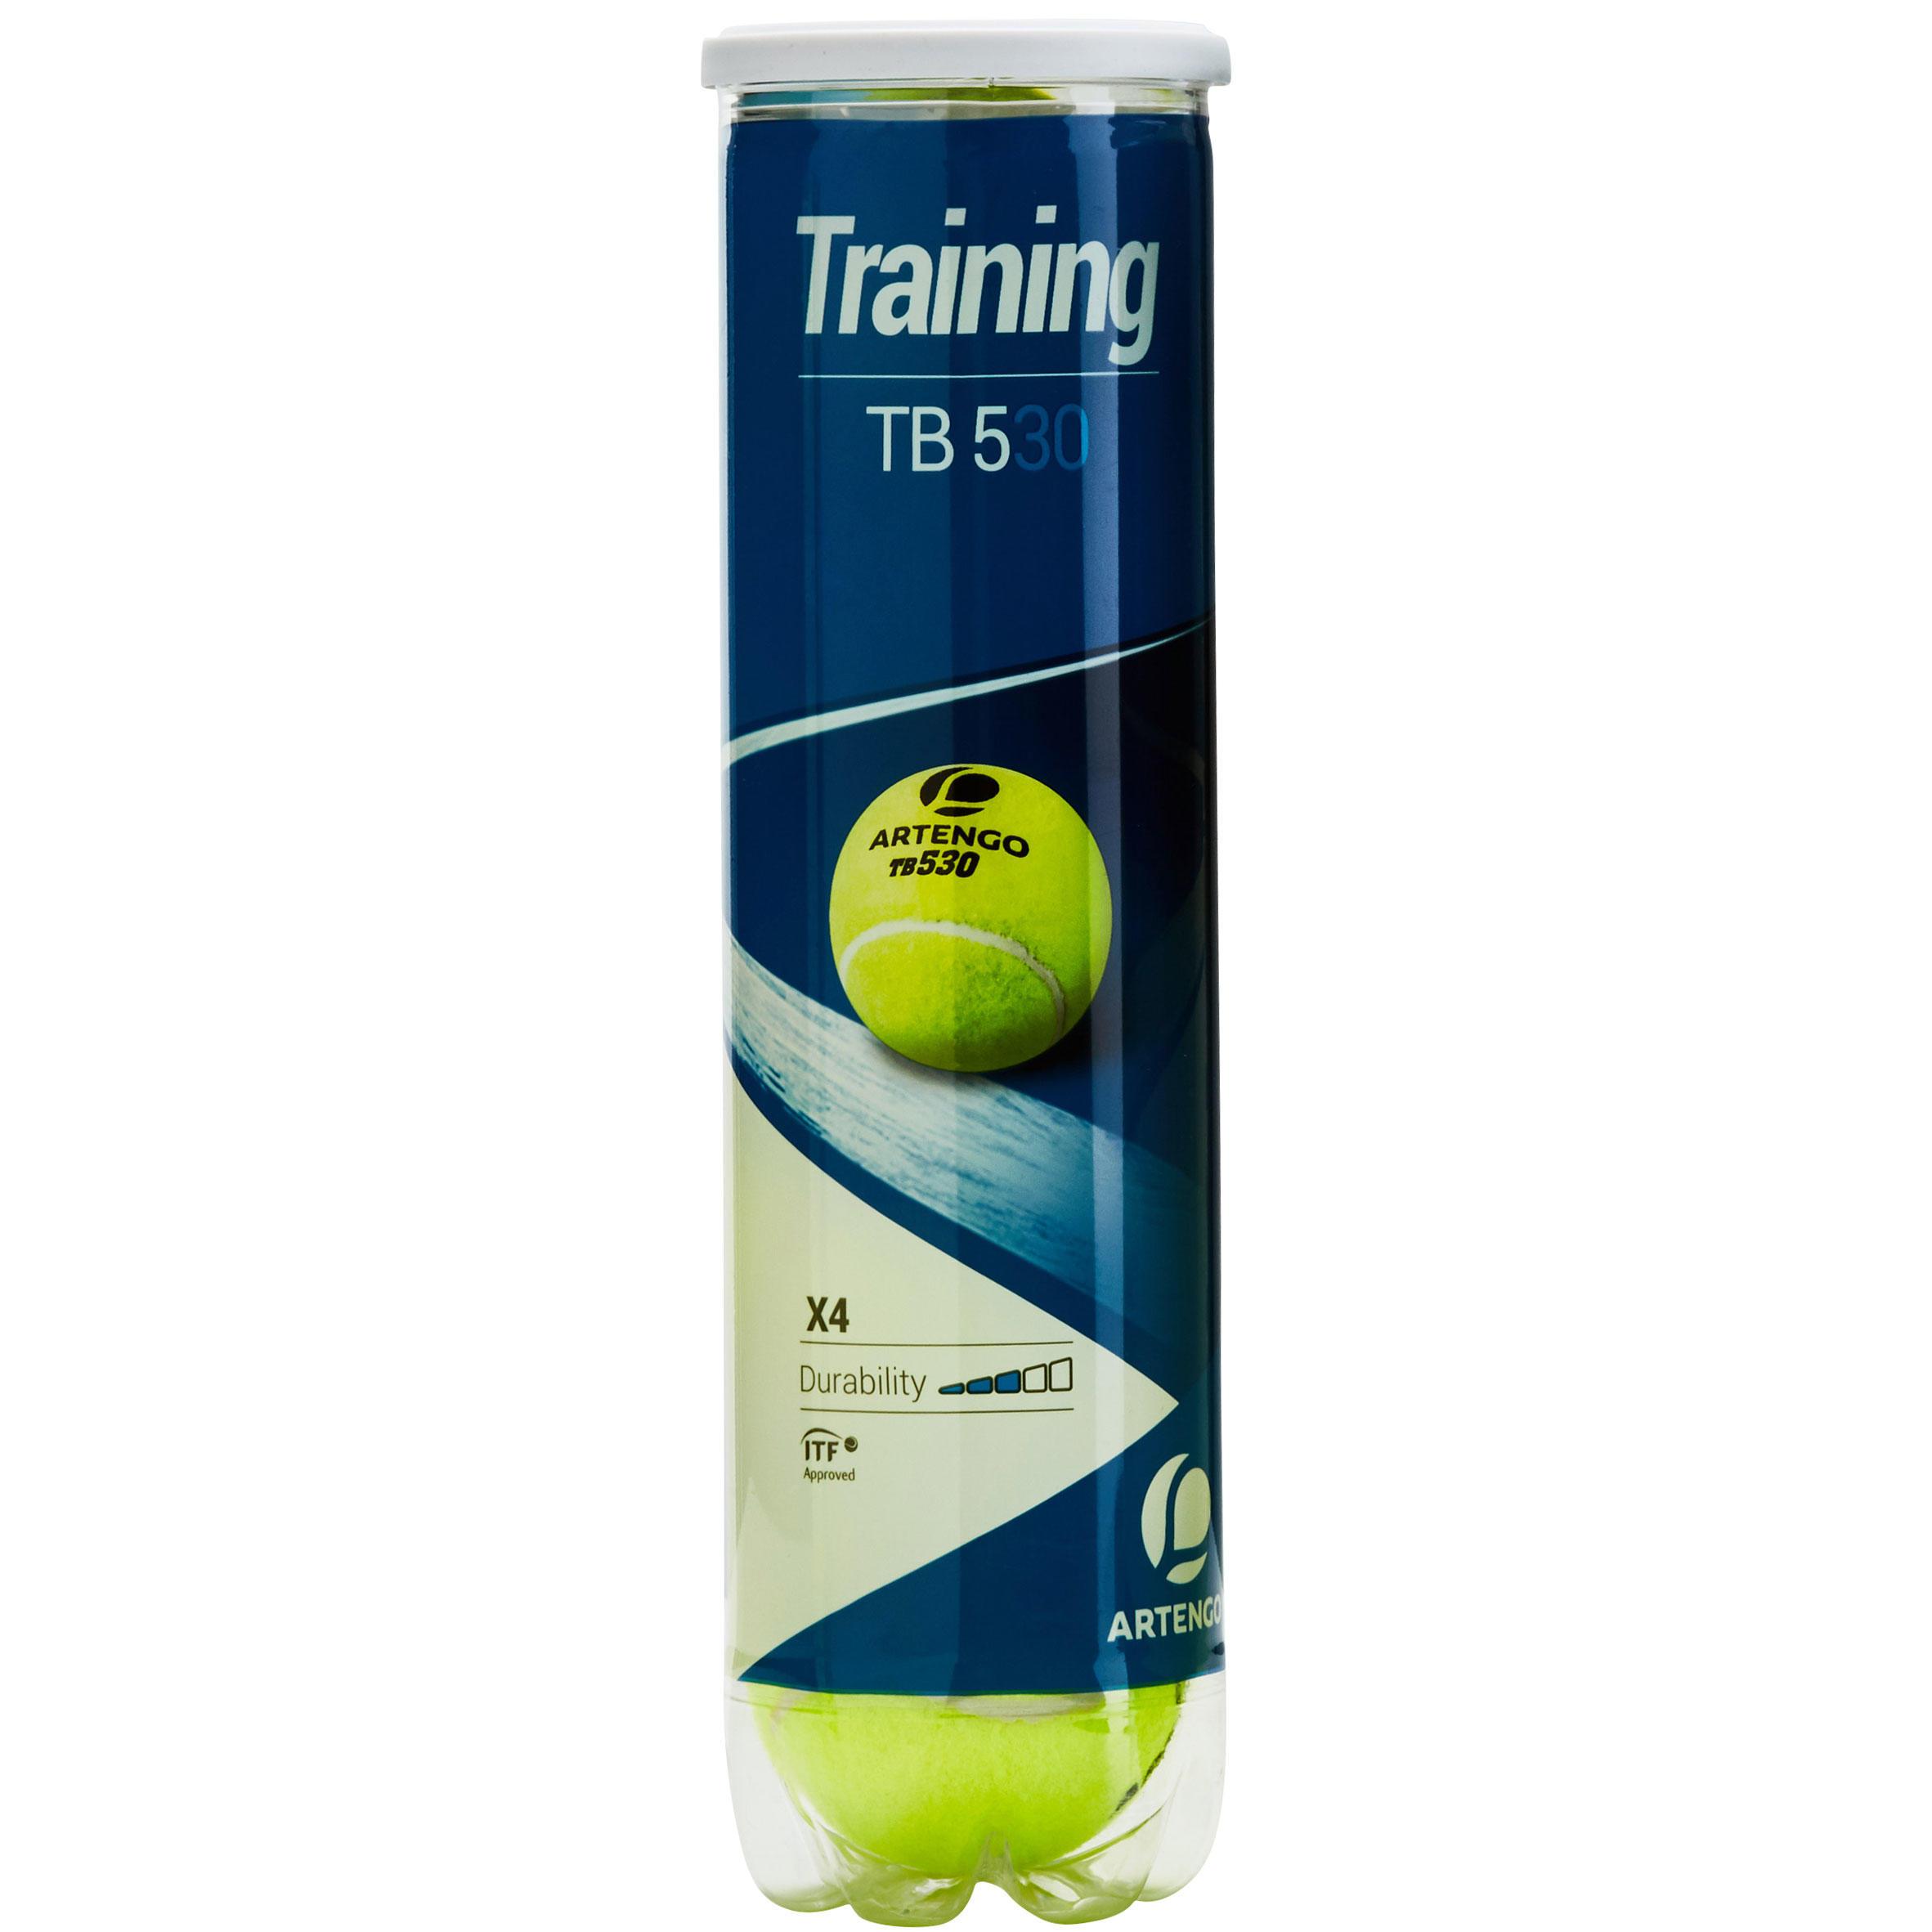 TB 530 Training Tennis Ball 4-Pack - Yellow